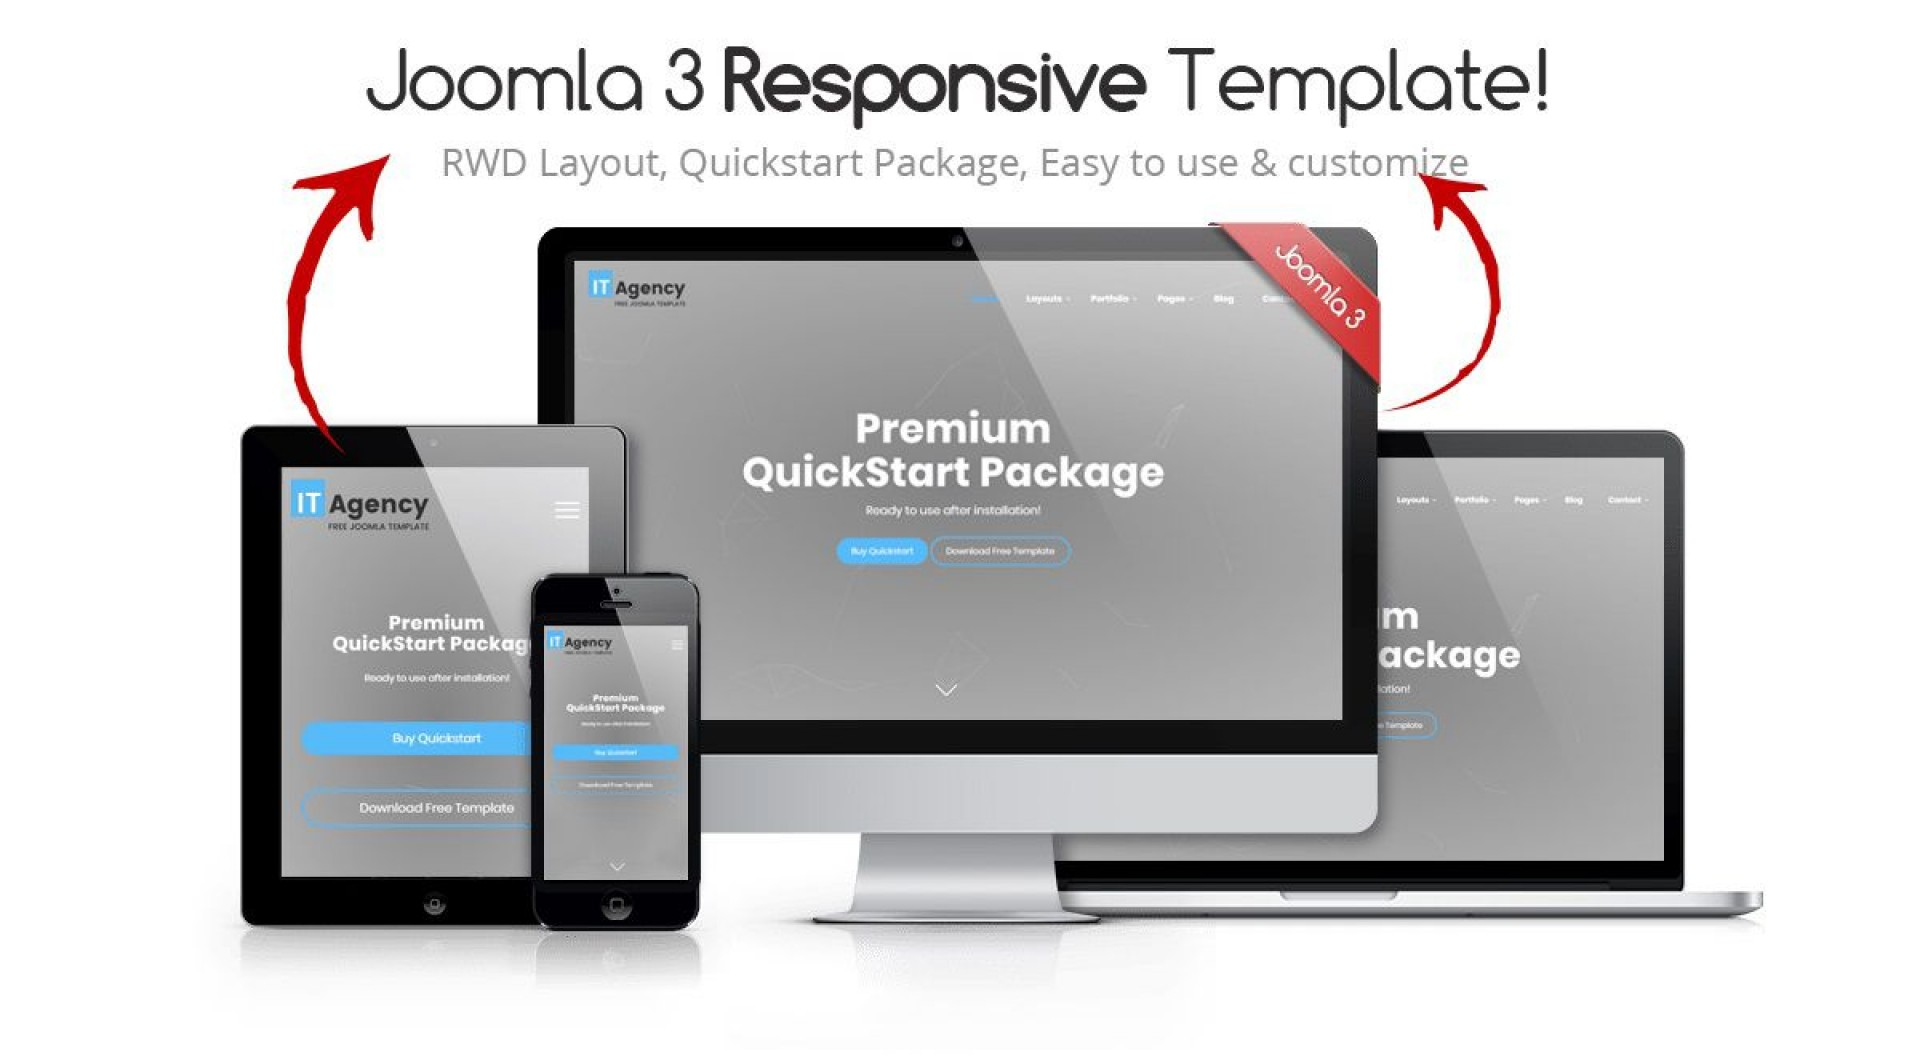 002 Unforgettable Joomla Responsive Template Free Example  3.0 Download Busines 31920